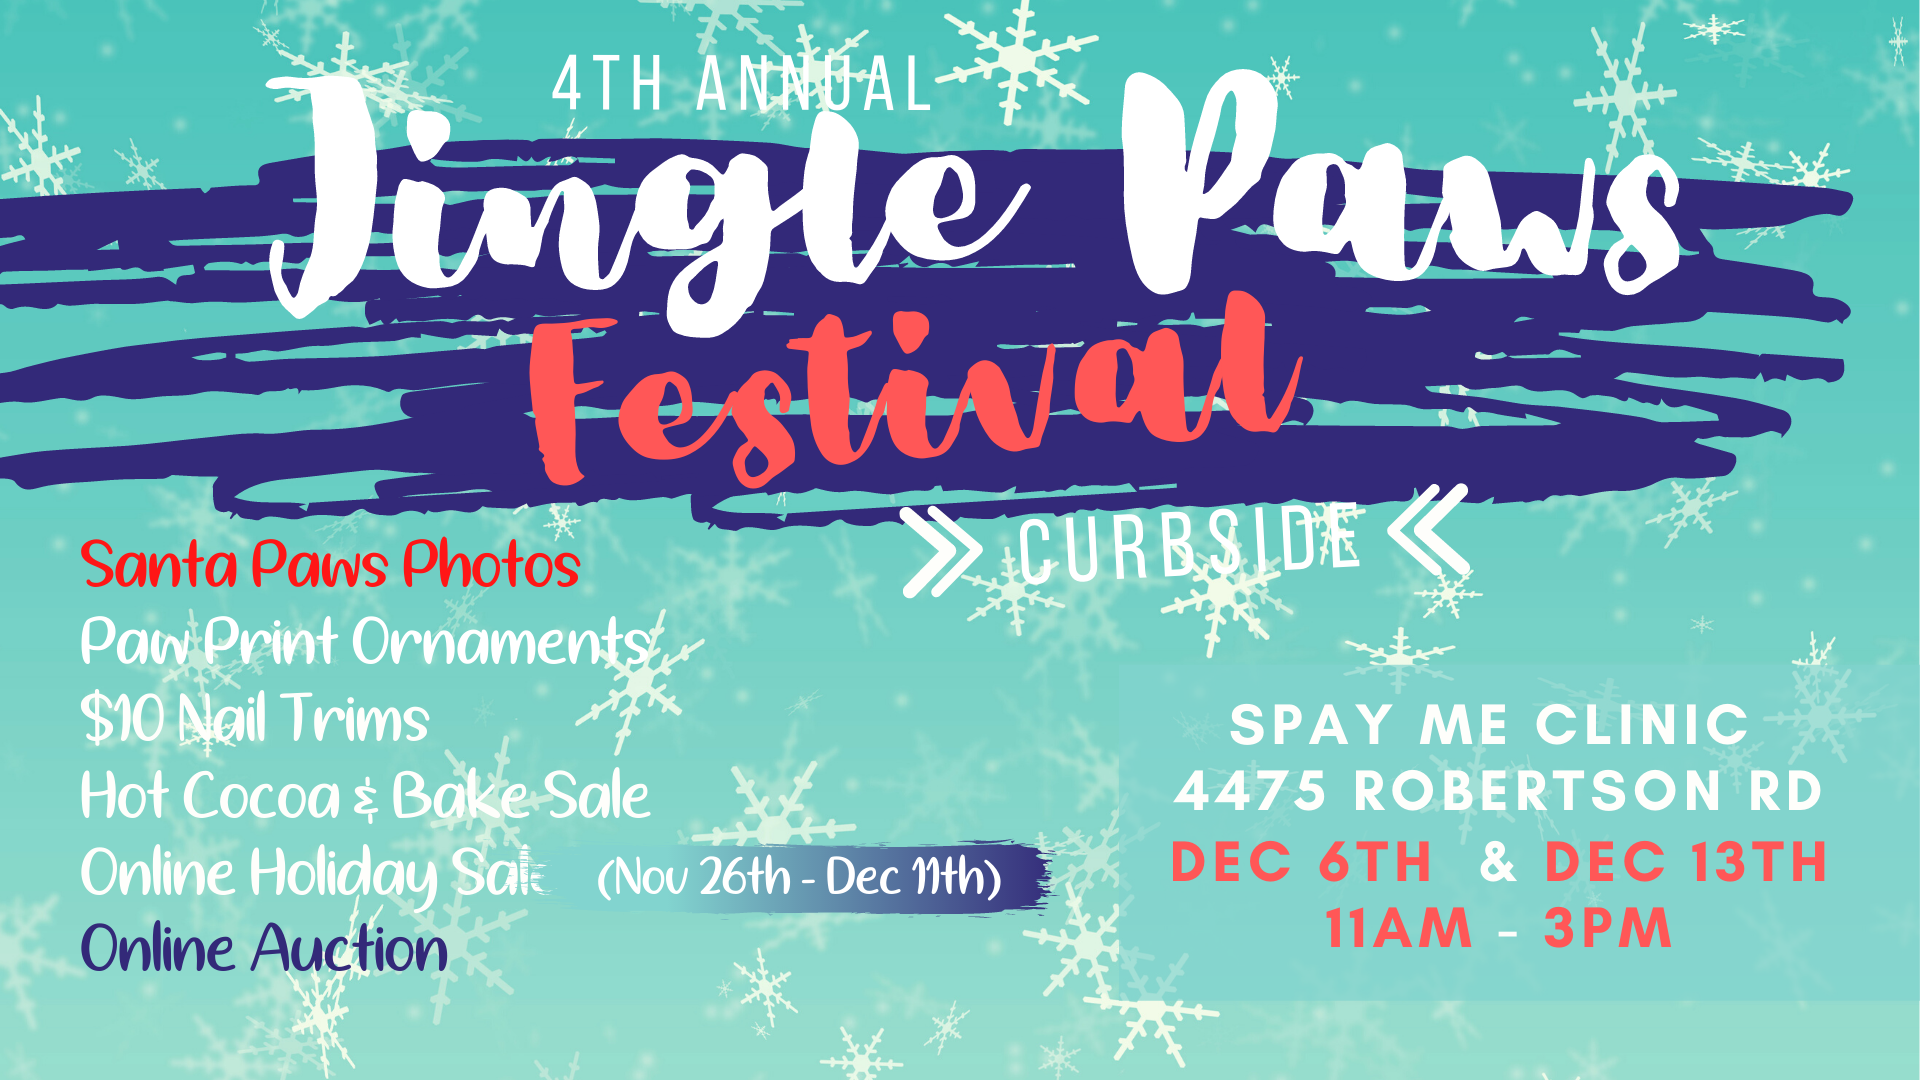 Jingle Paws Festival 2020